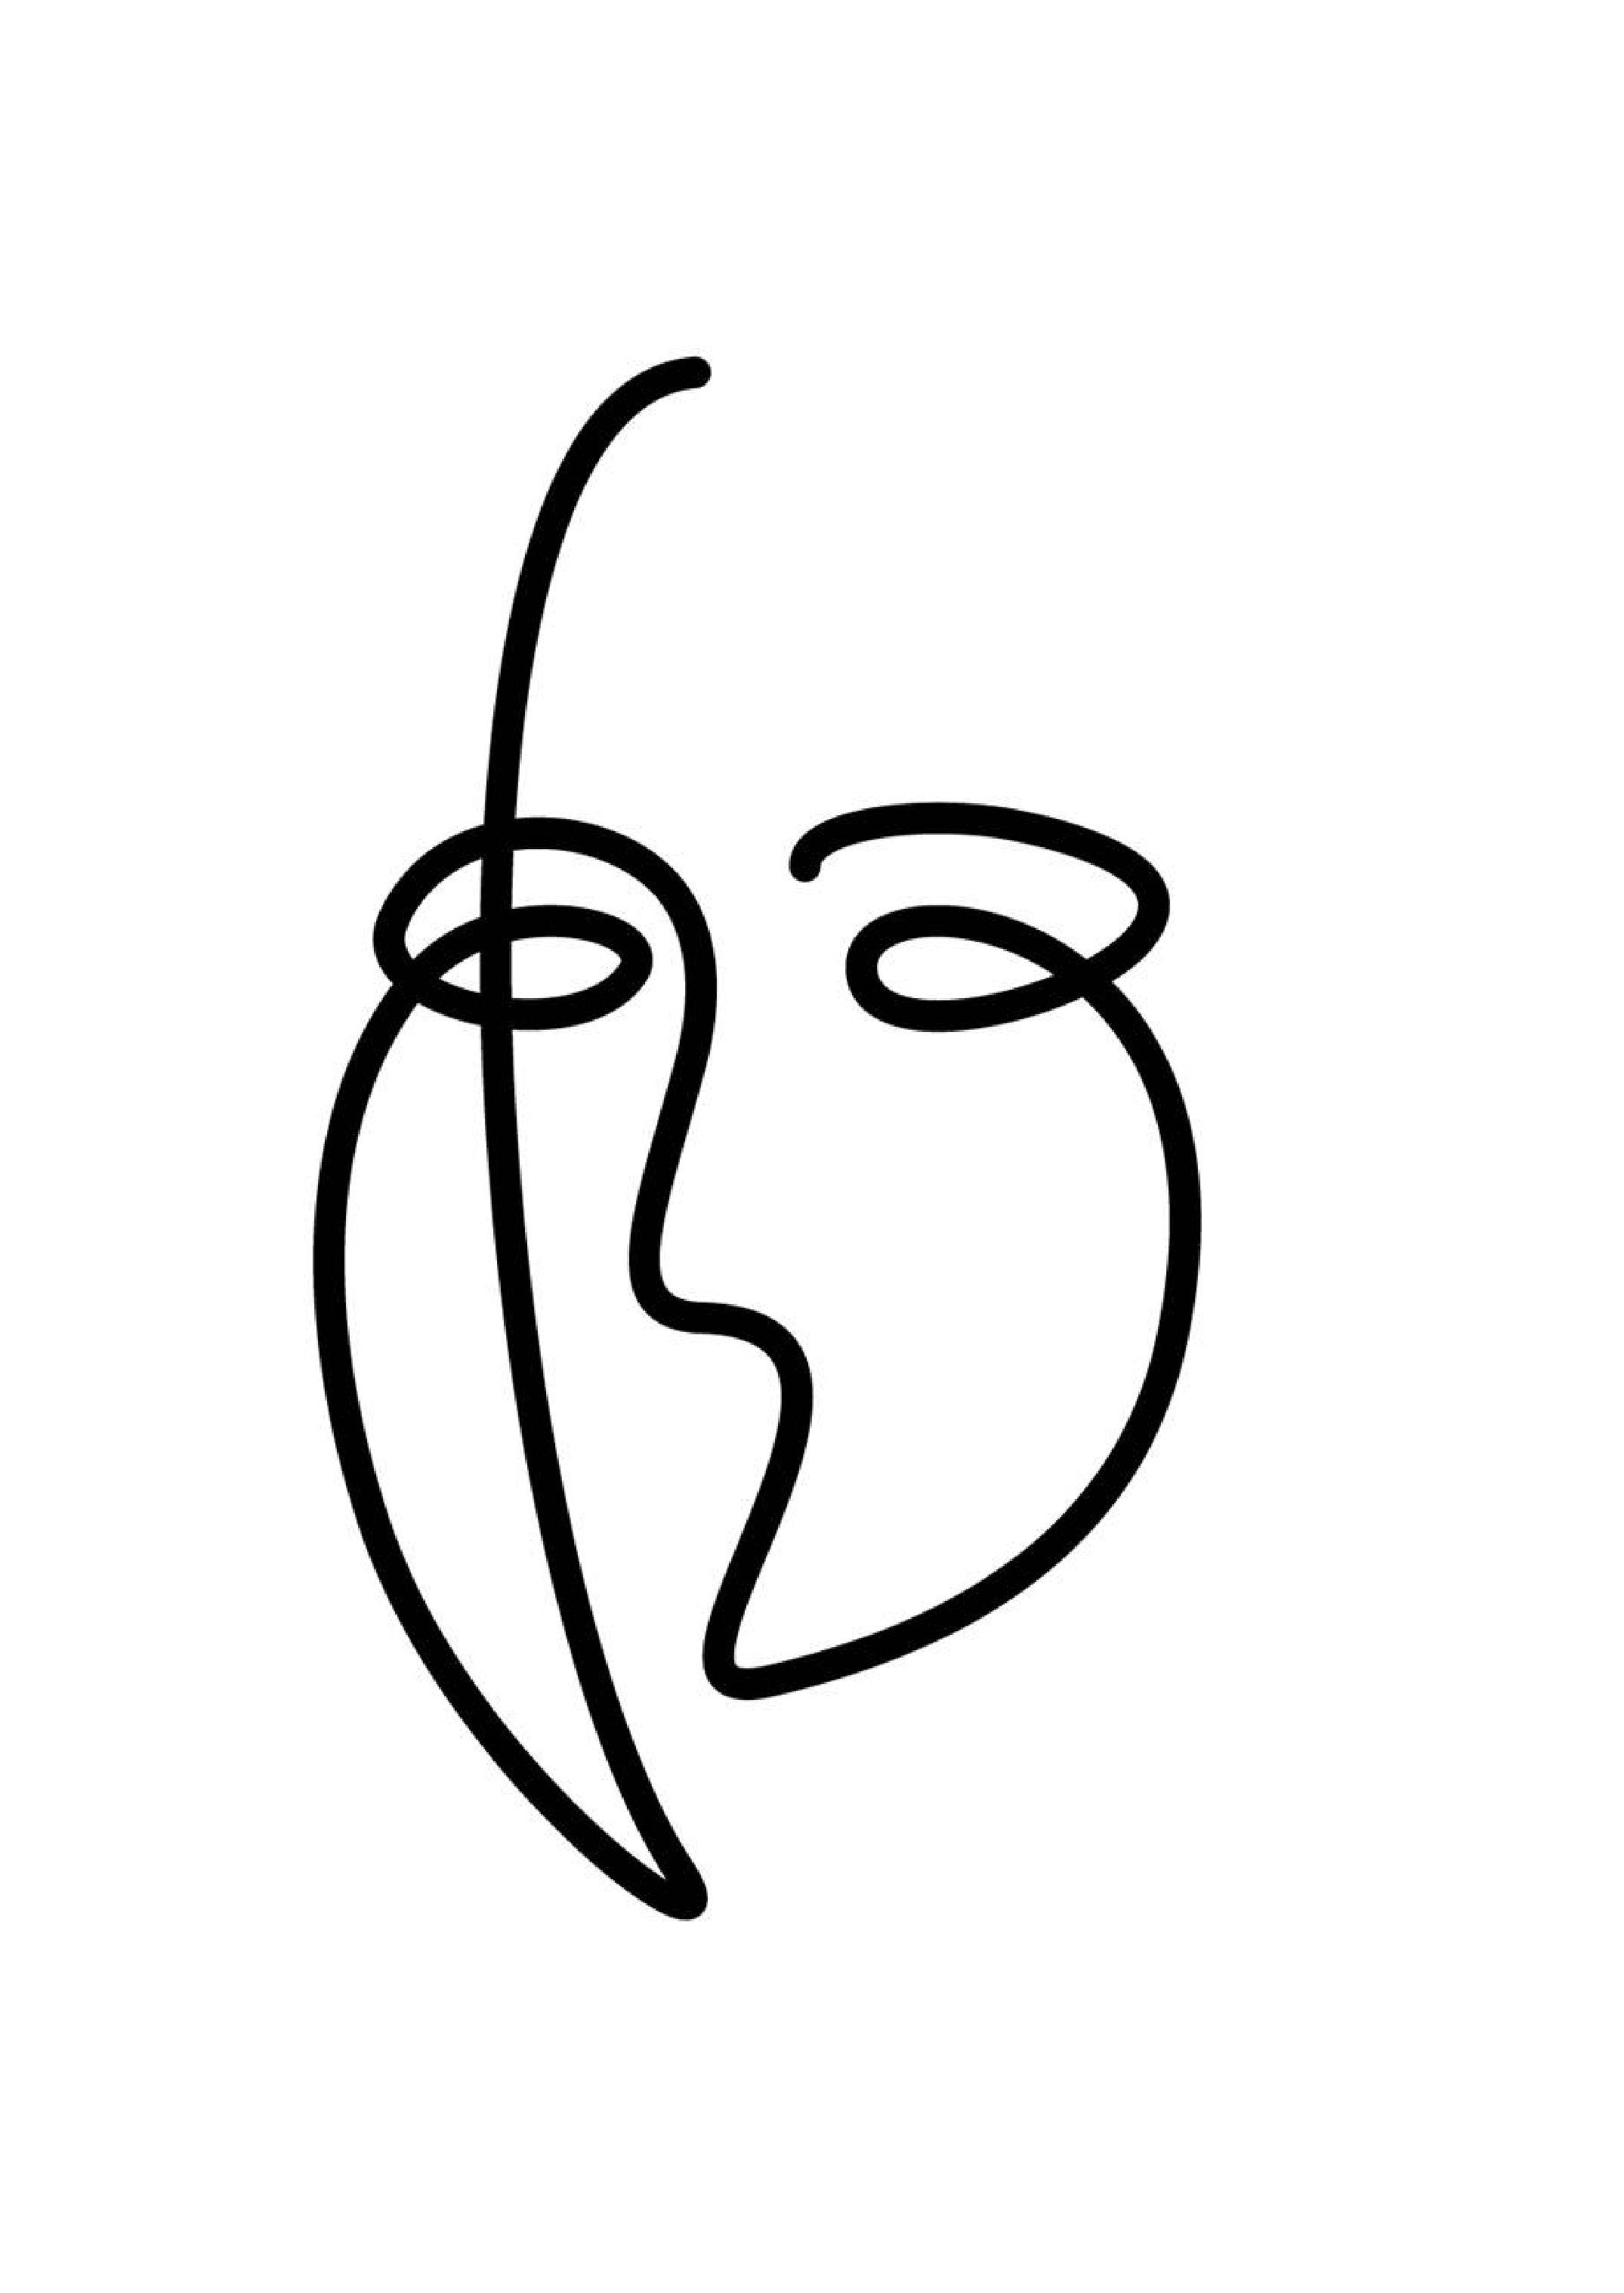 Proektirovanie 1 Kurs Malysheva Tatyana First Year Malysheva Tatyana Arte Minimalista Arte De Silueta Dibujo Lineal